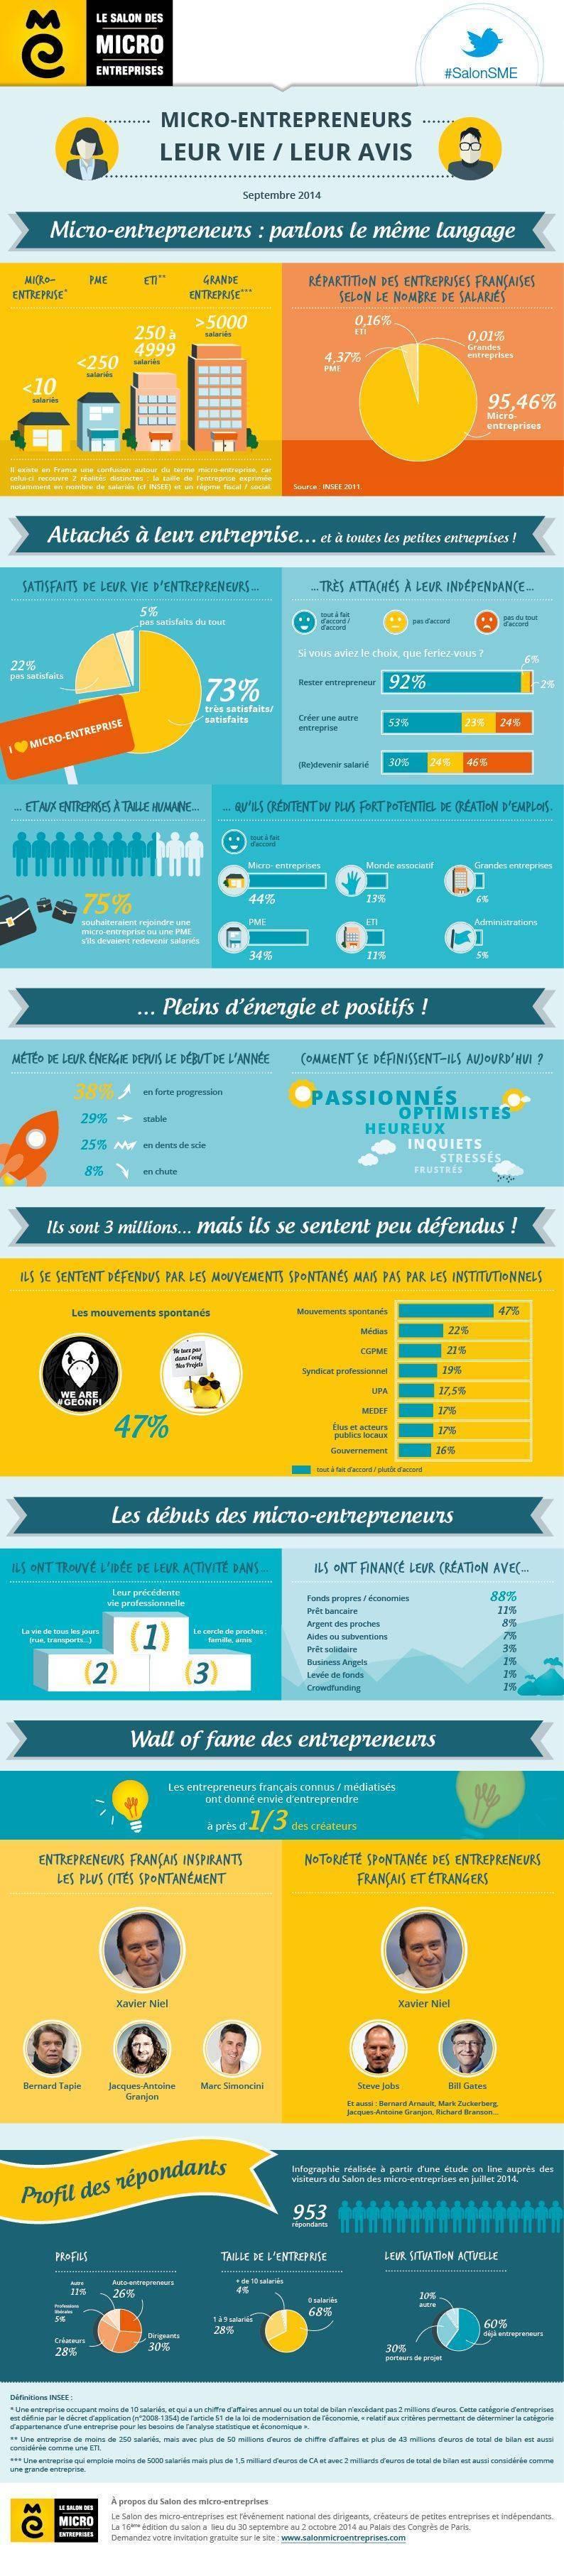 infographie-micro-entrepreneur